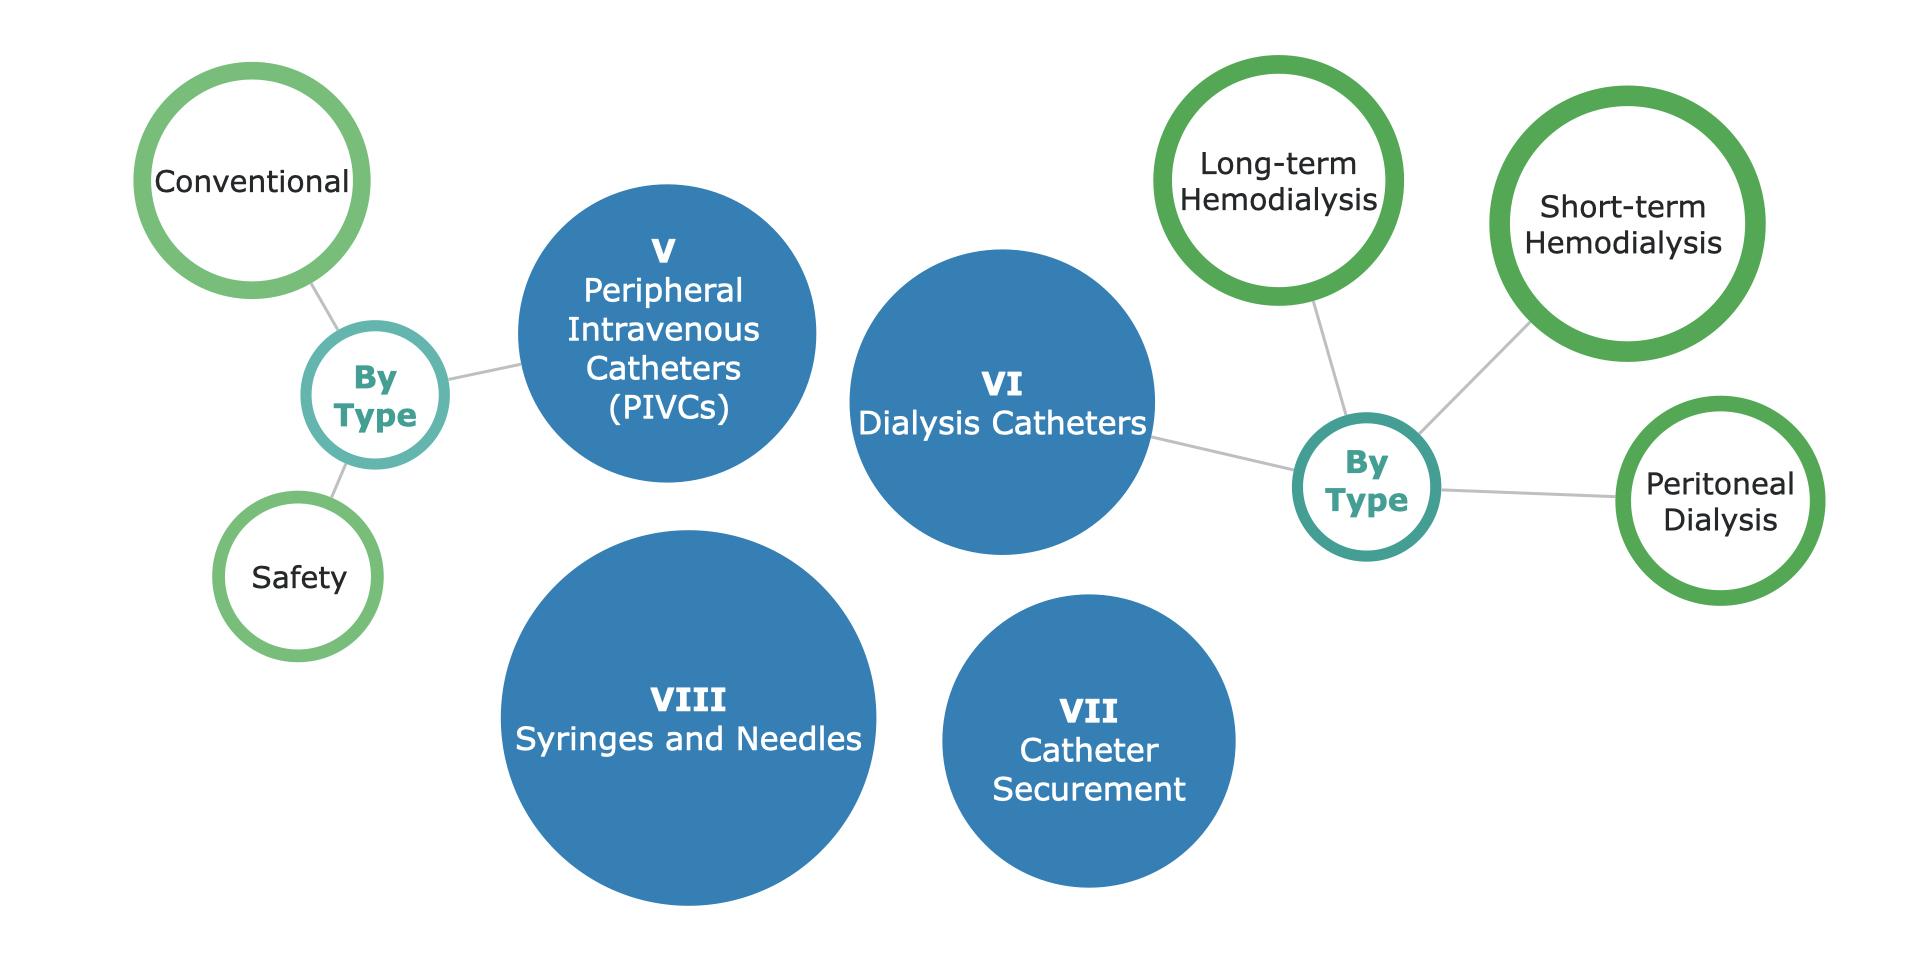 Global Vascular Access Market Segmentation, part 2